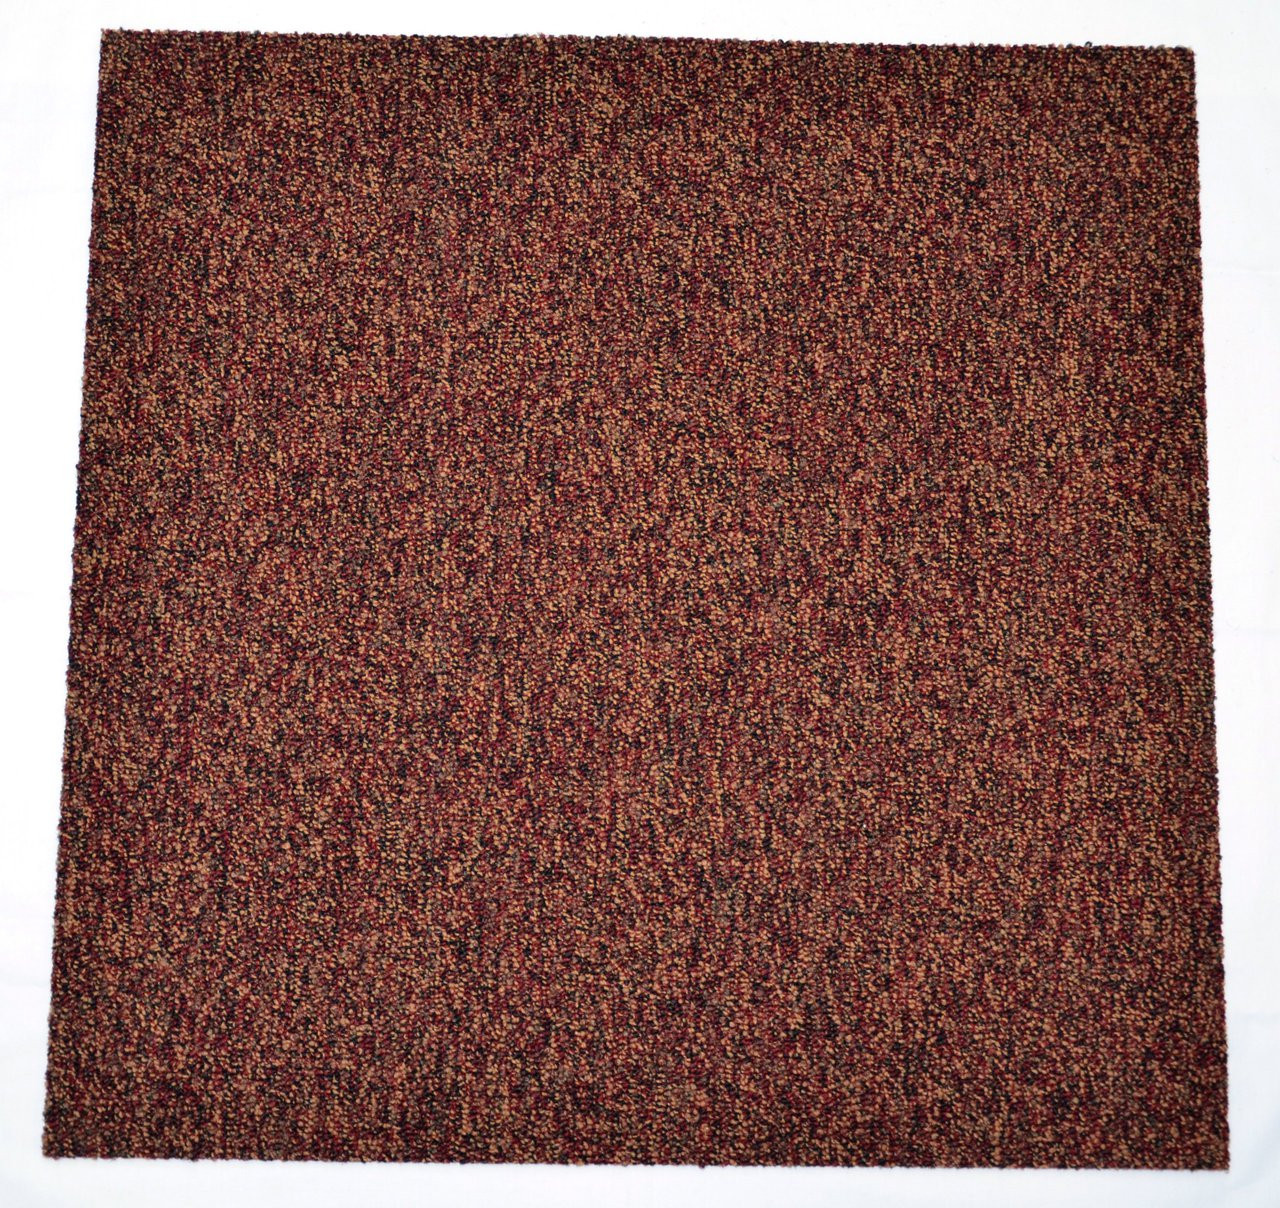 Diy Carpet Tile Squares Multicolor Tweed Dean Stair Treads